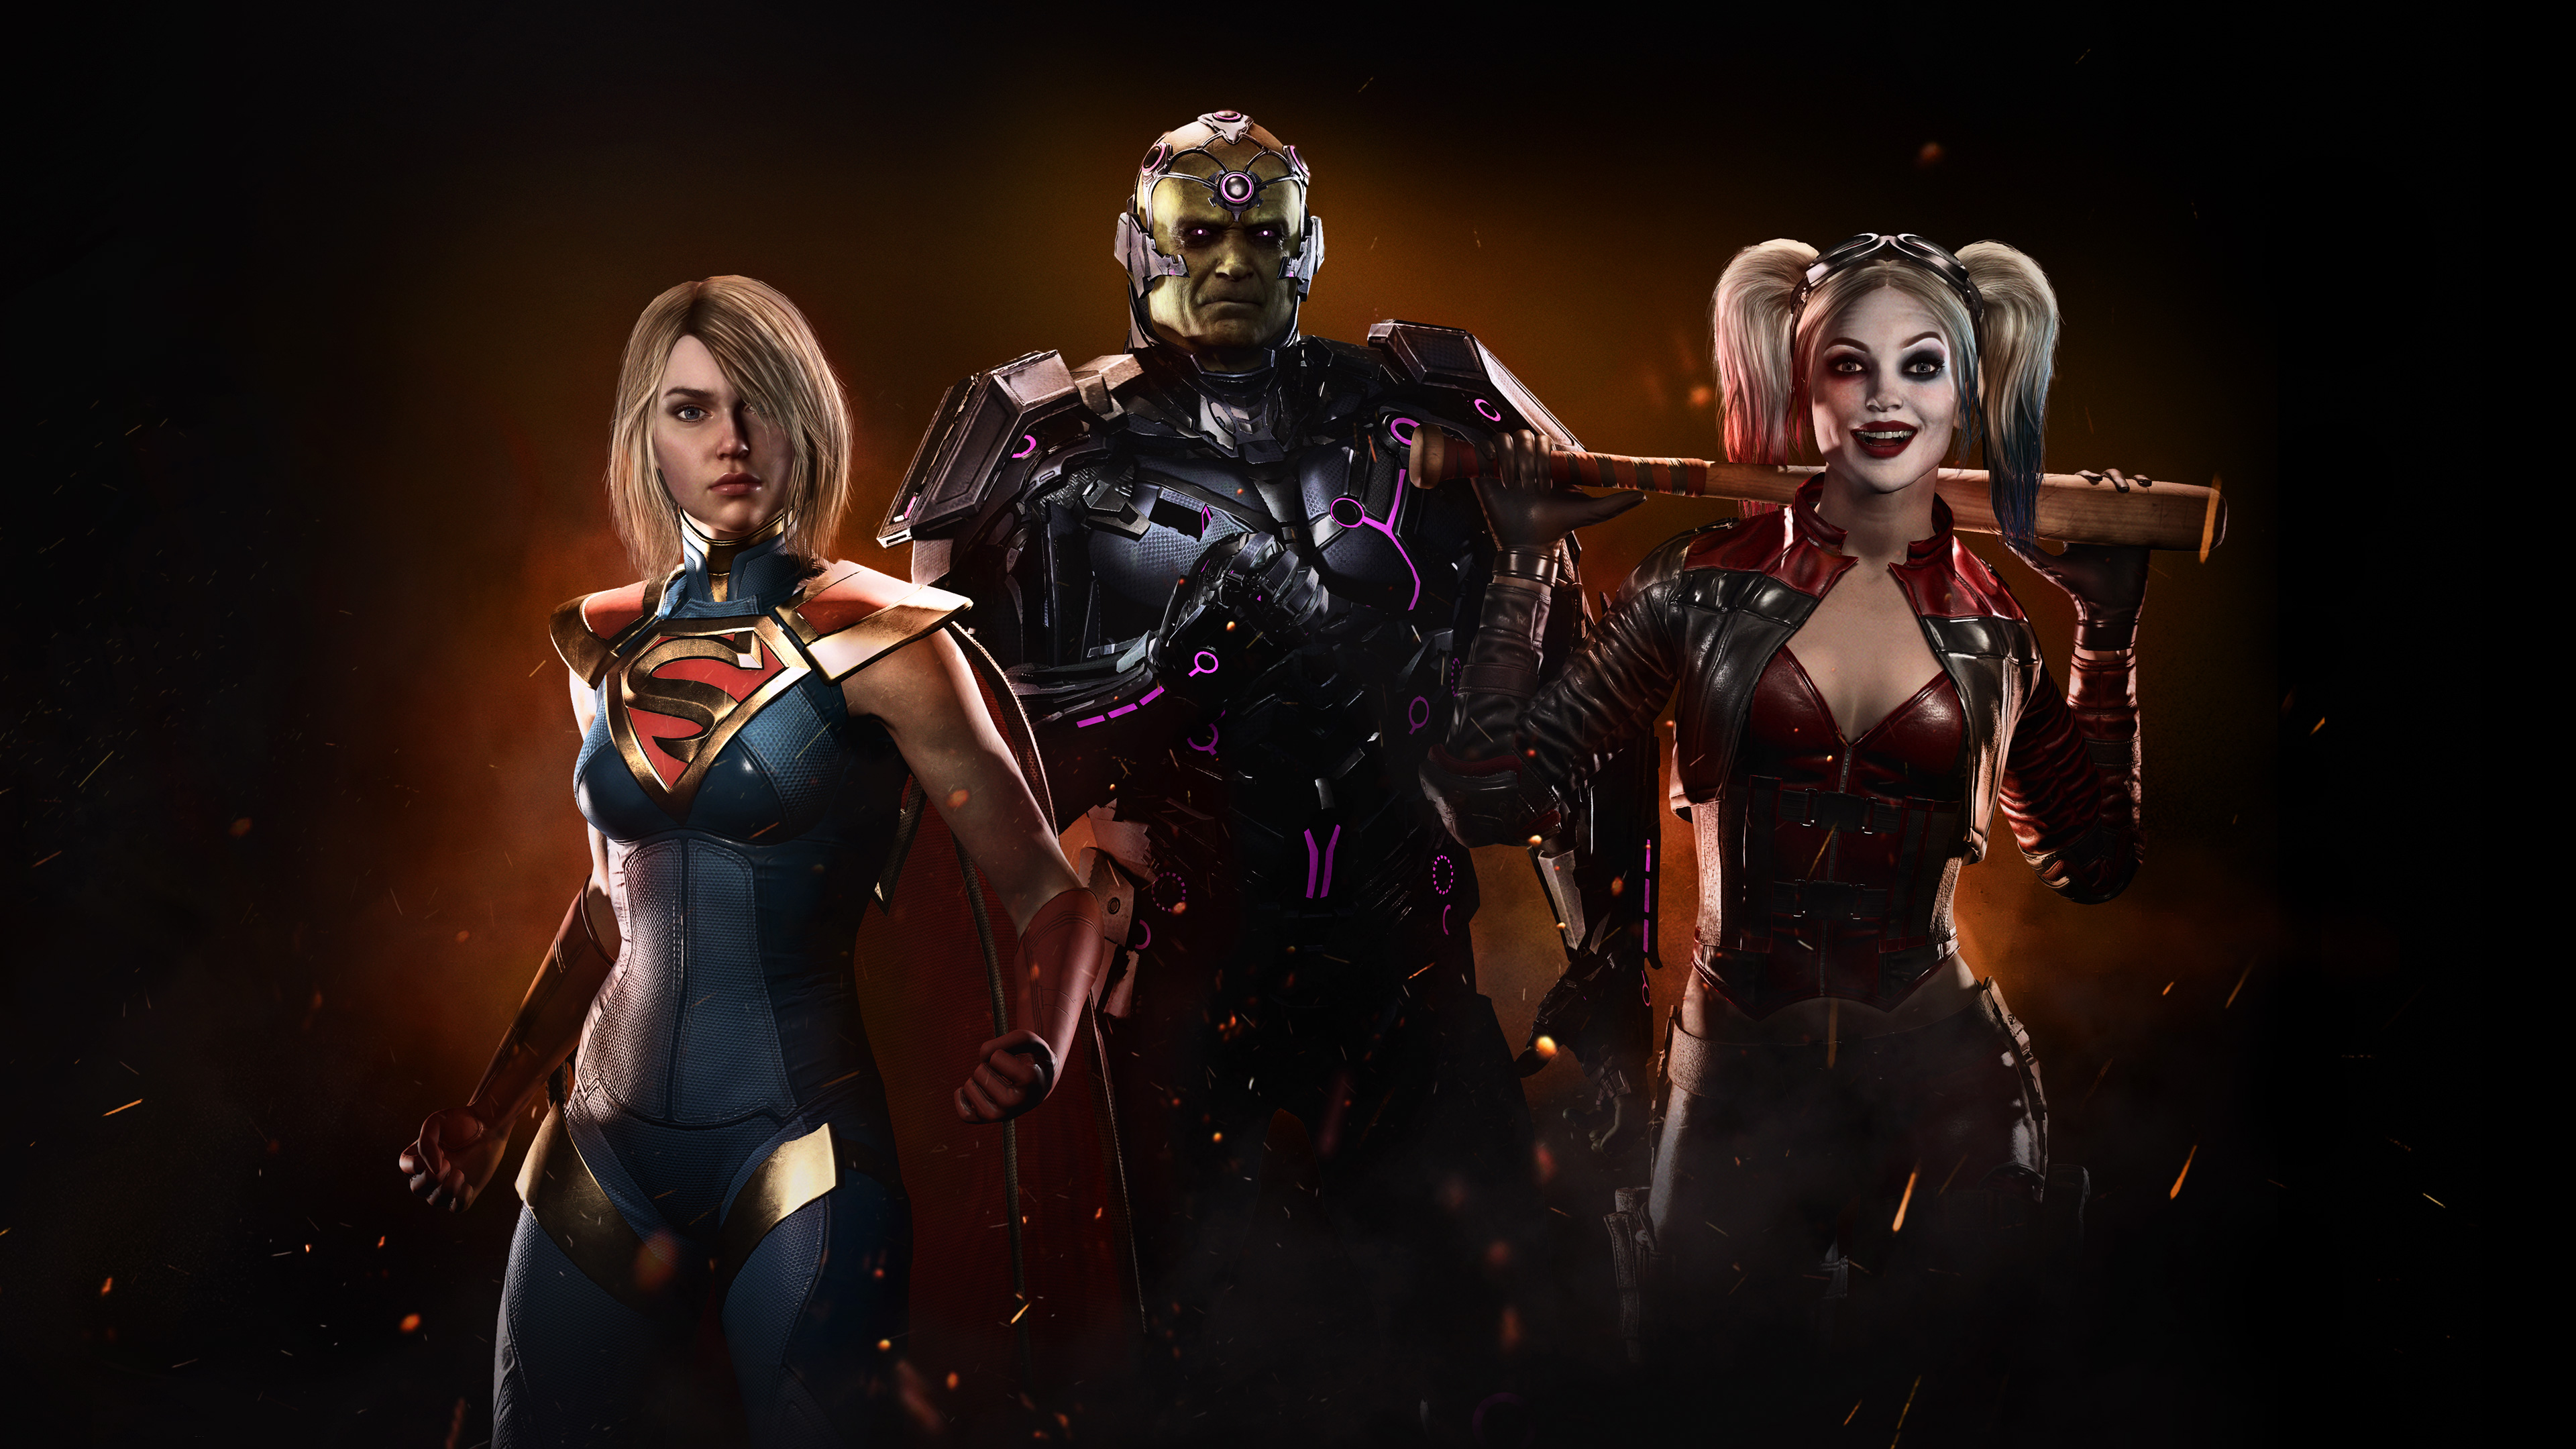 Injustice 2 Supergirl Harley Quinn 4k Hd Games 4k Wallpapers